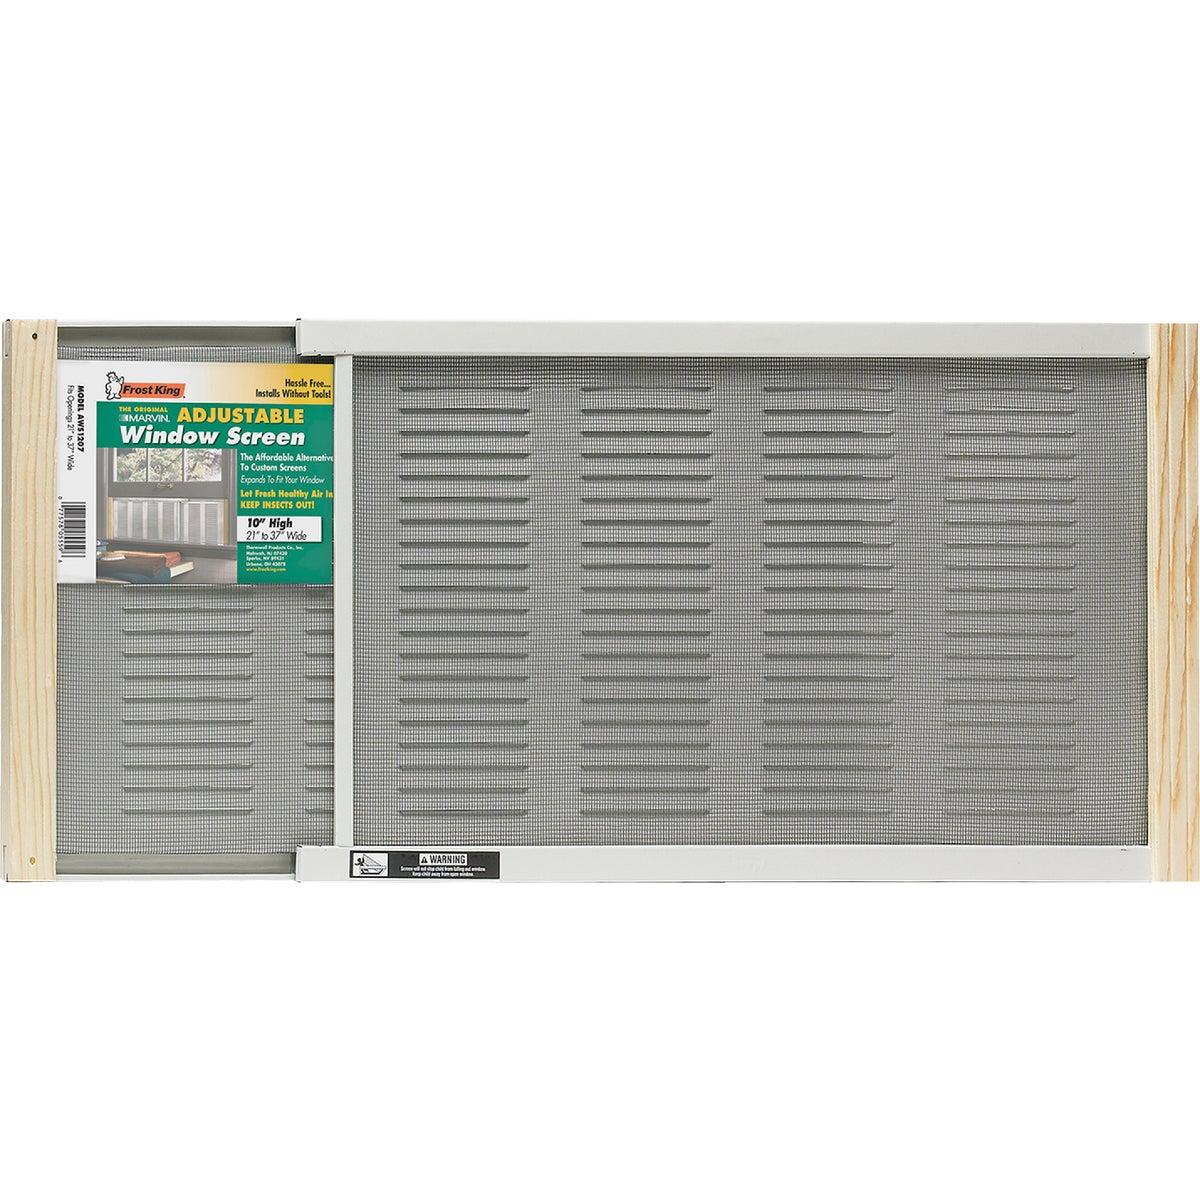 Wndw Screen W/Ventilator